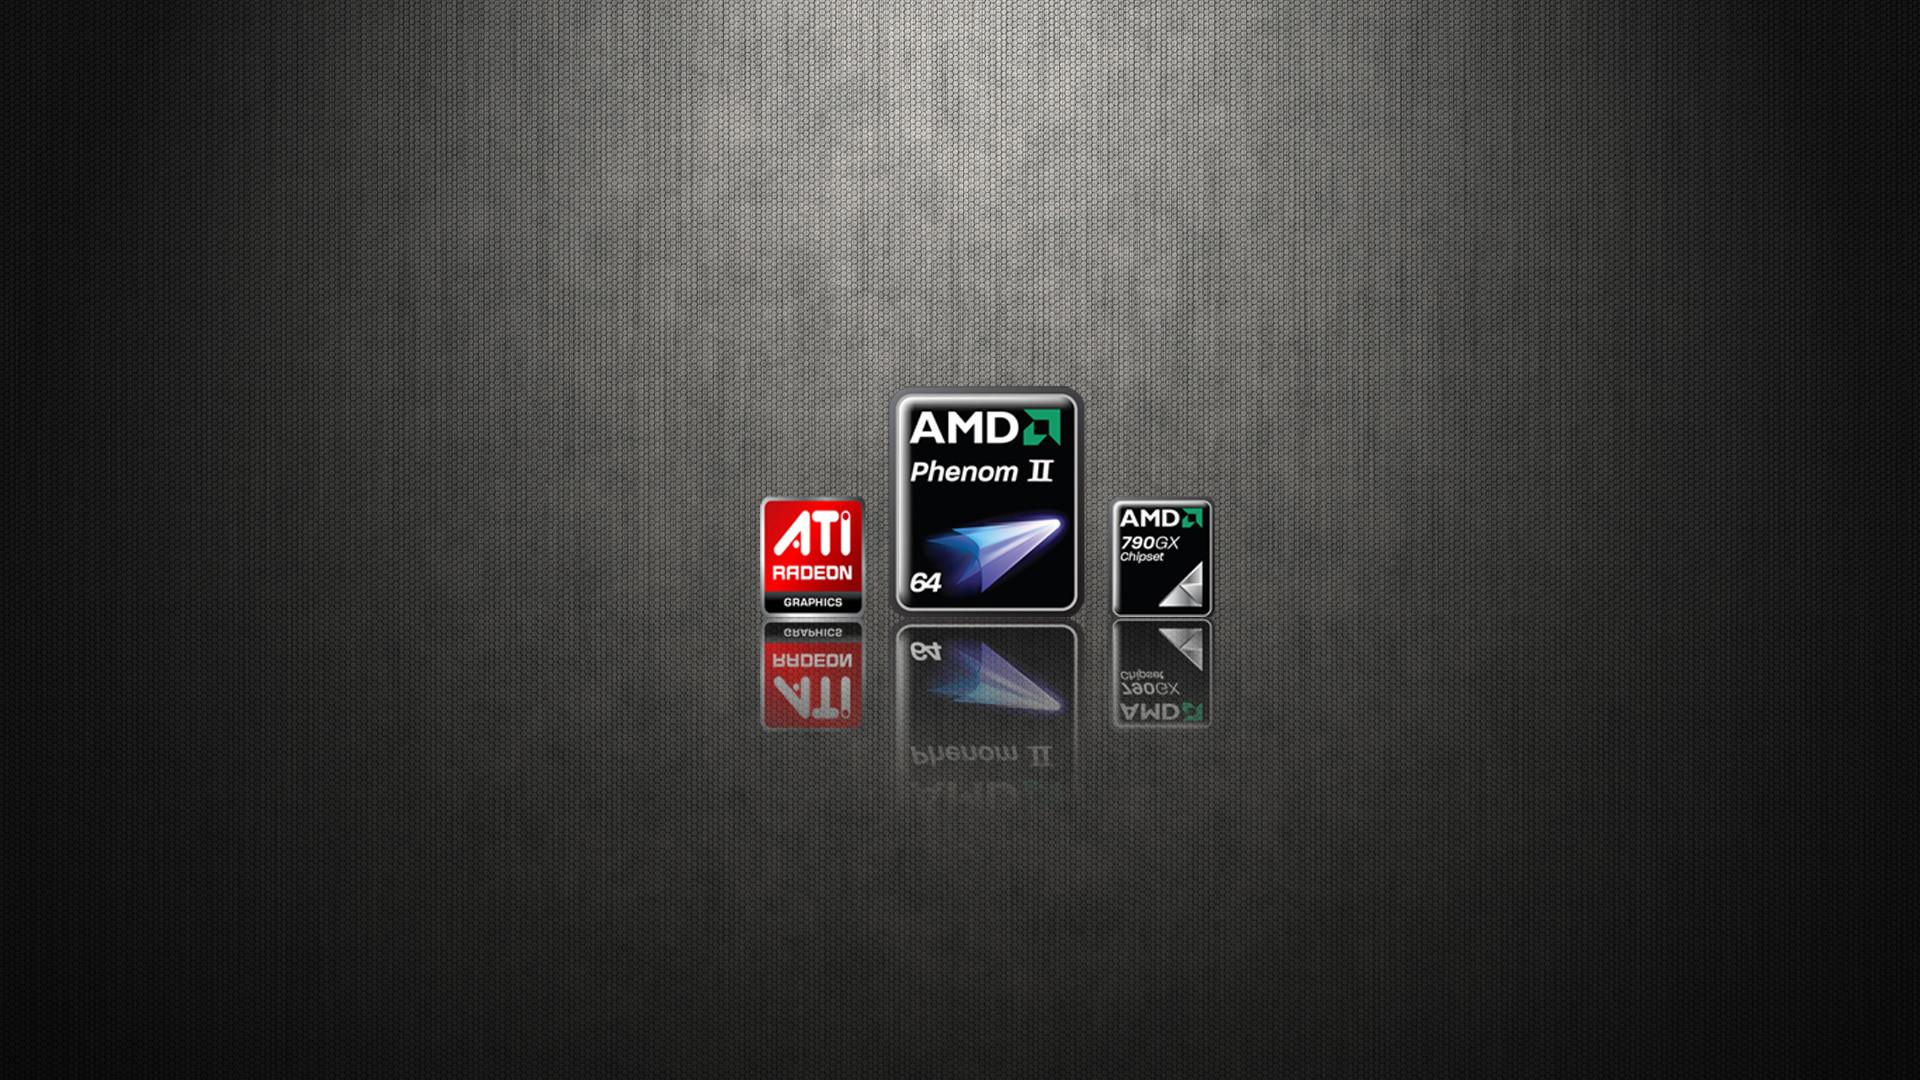 AMD black logo wallpaper,Other hd Wallpaper For Desktop,Technology .